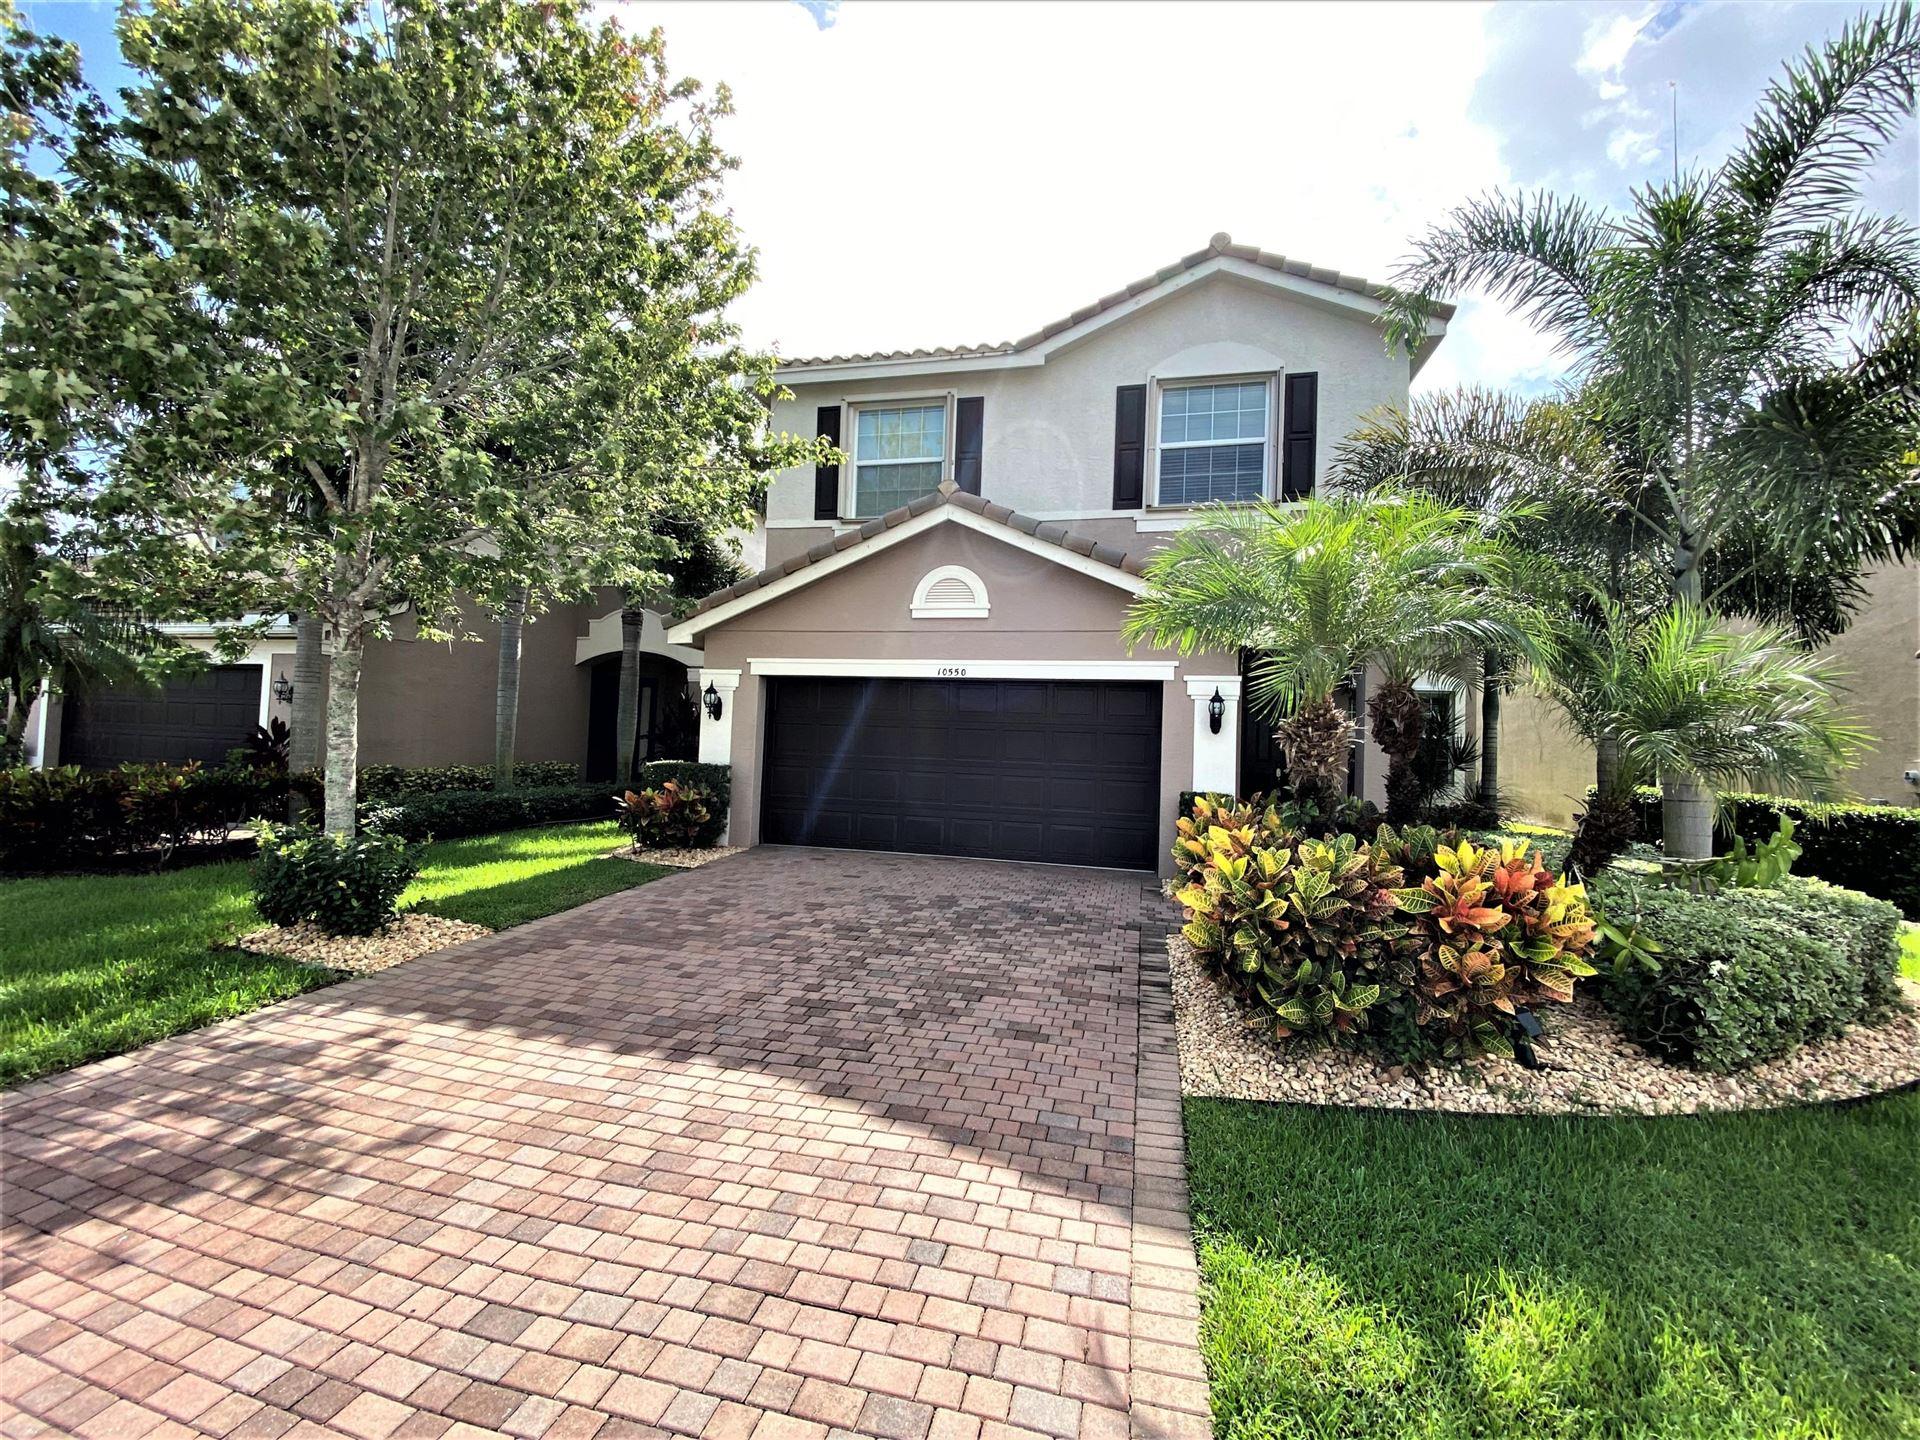 10550 Cape Delabra Court, Boynton Beach, FL 33473 - MLS#: RX-10625184